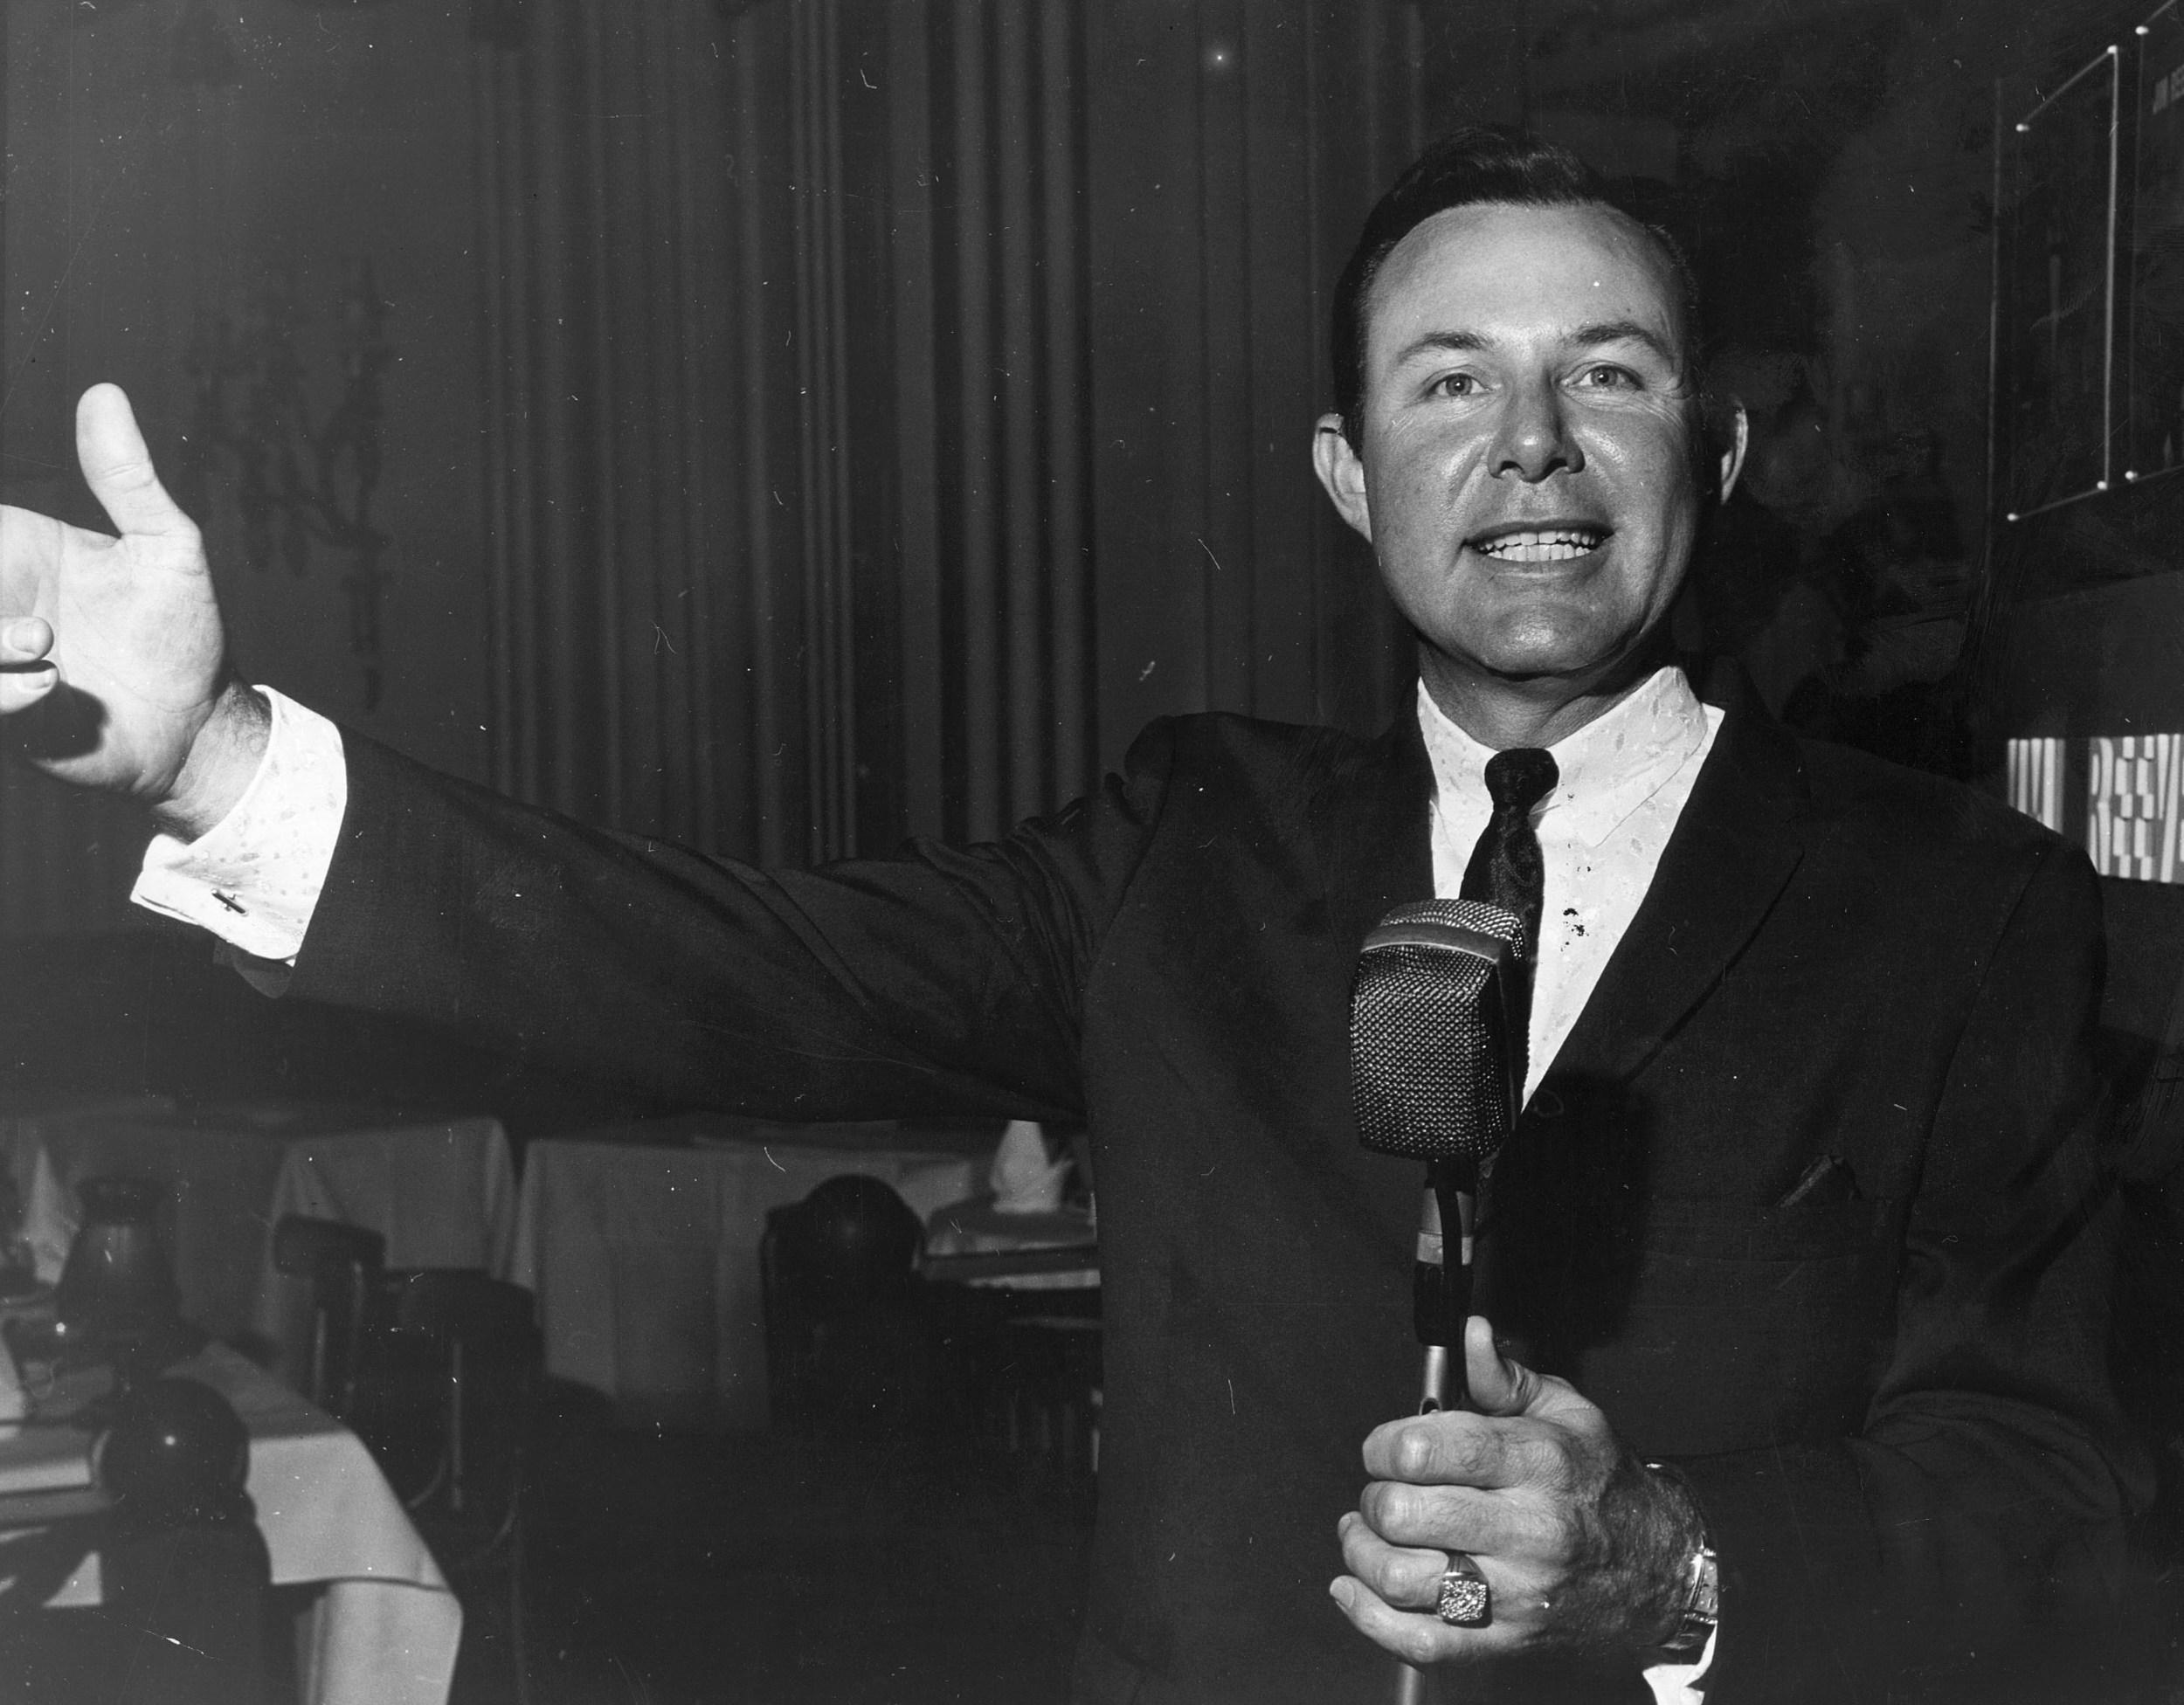 Top 10 Jim Reeves Songs – 49th Anniversary Of Jim Reeves\' Plane Crash